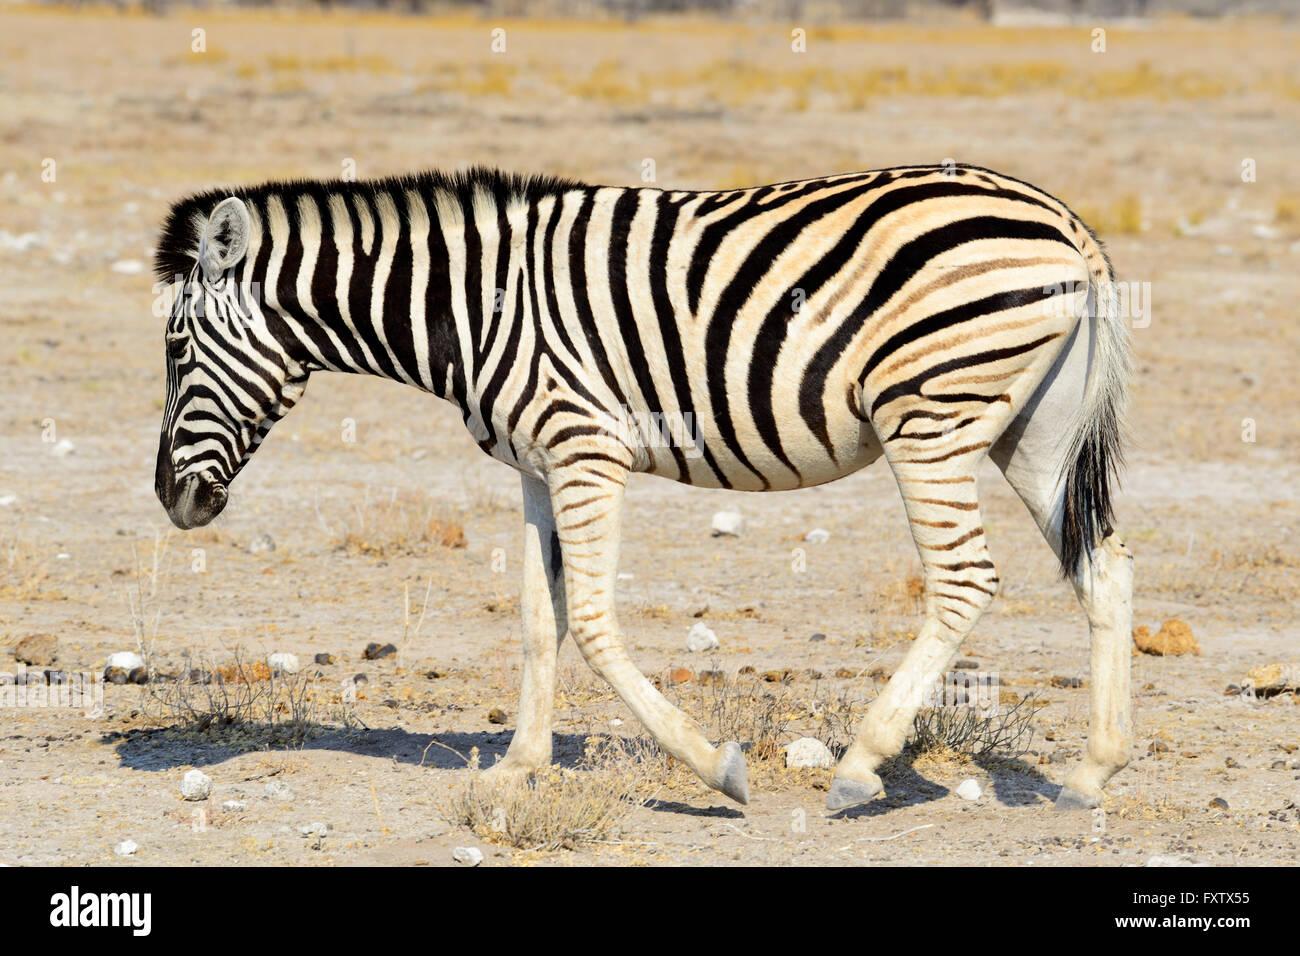 Burchell's Zebra (Equus burchellii) in Etosha National Park, Namibia - Stock Image